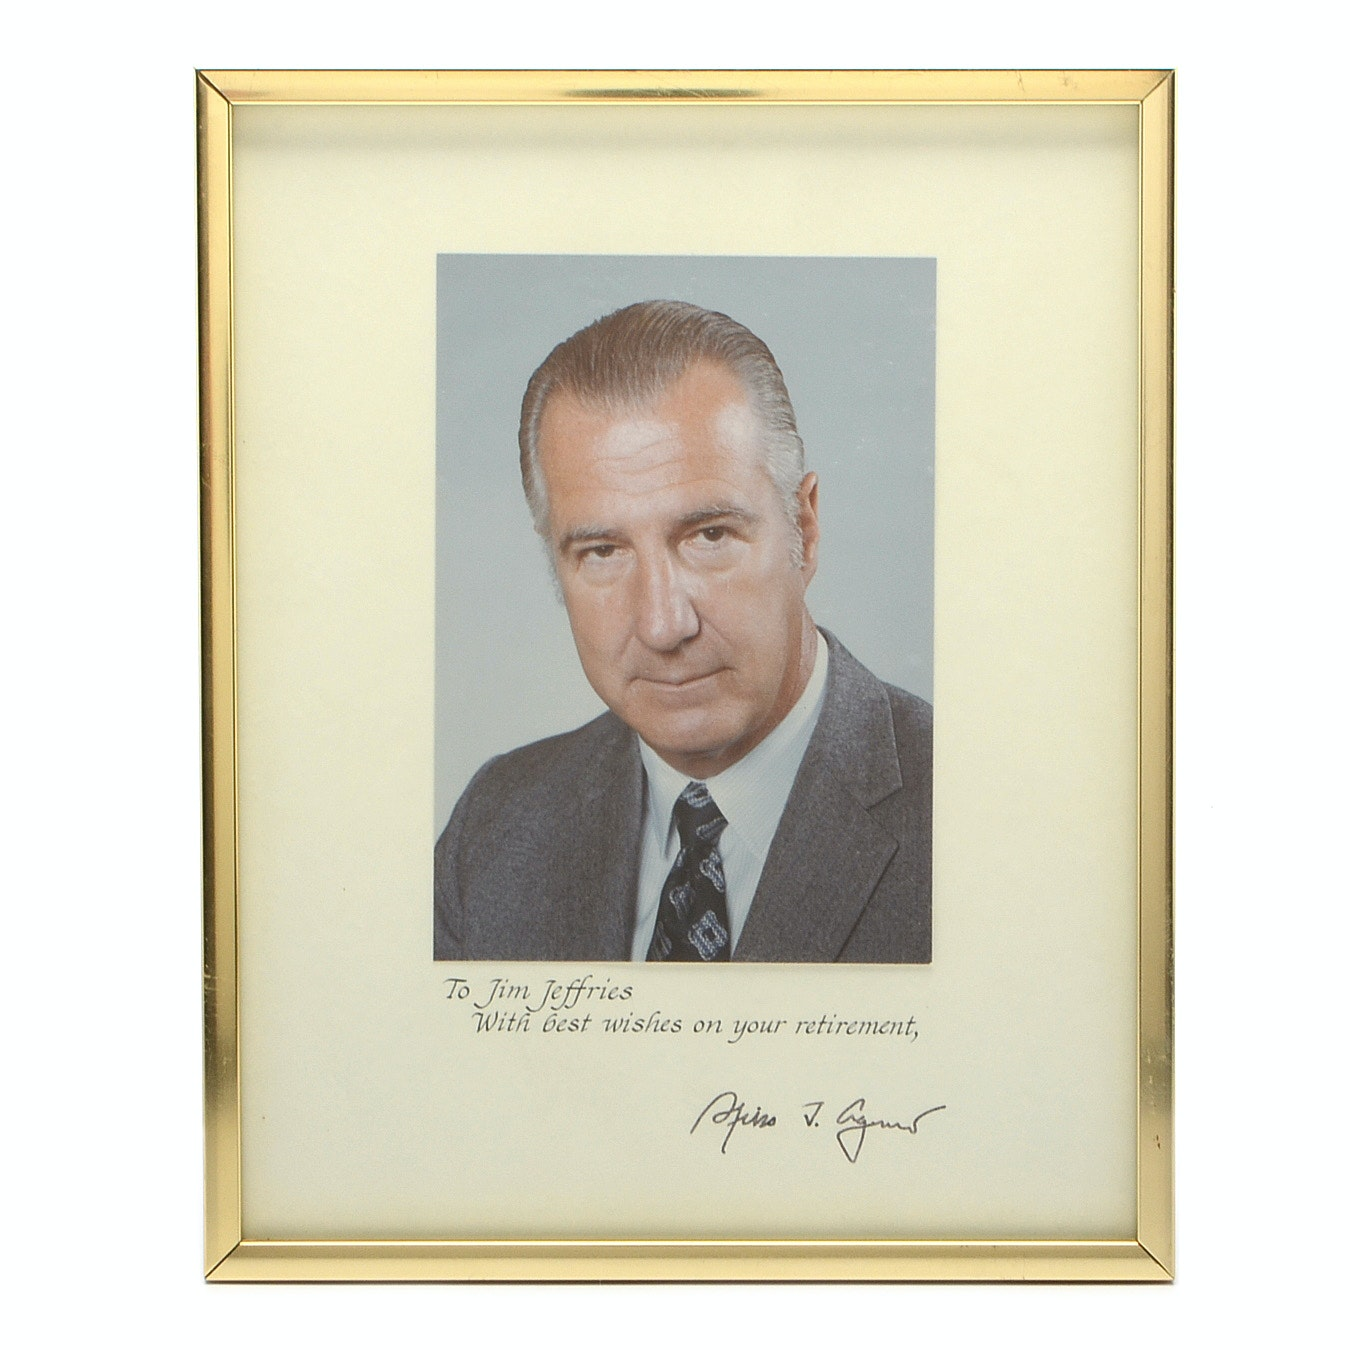 Vice-President Spiro Agnew Presentational Framed Photo Print